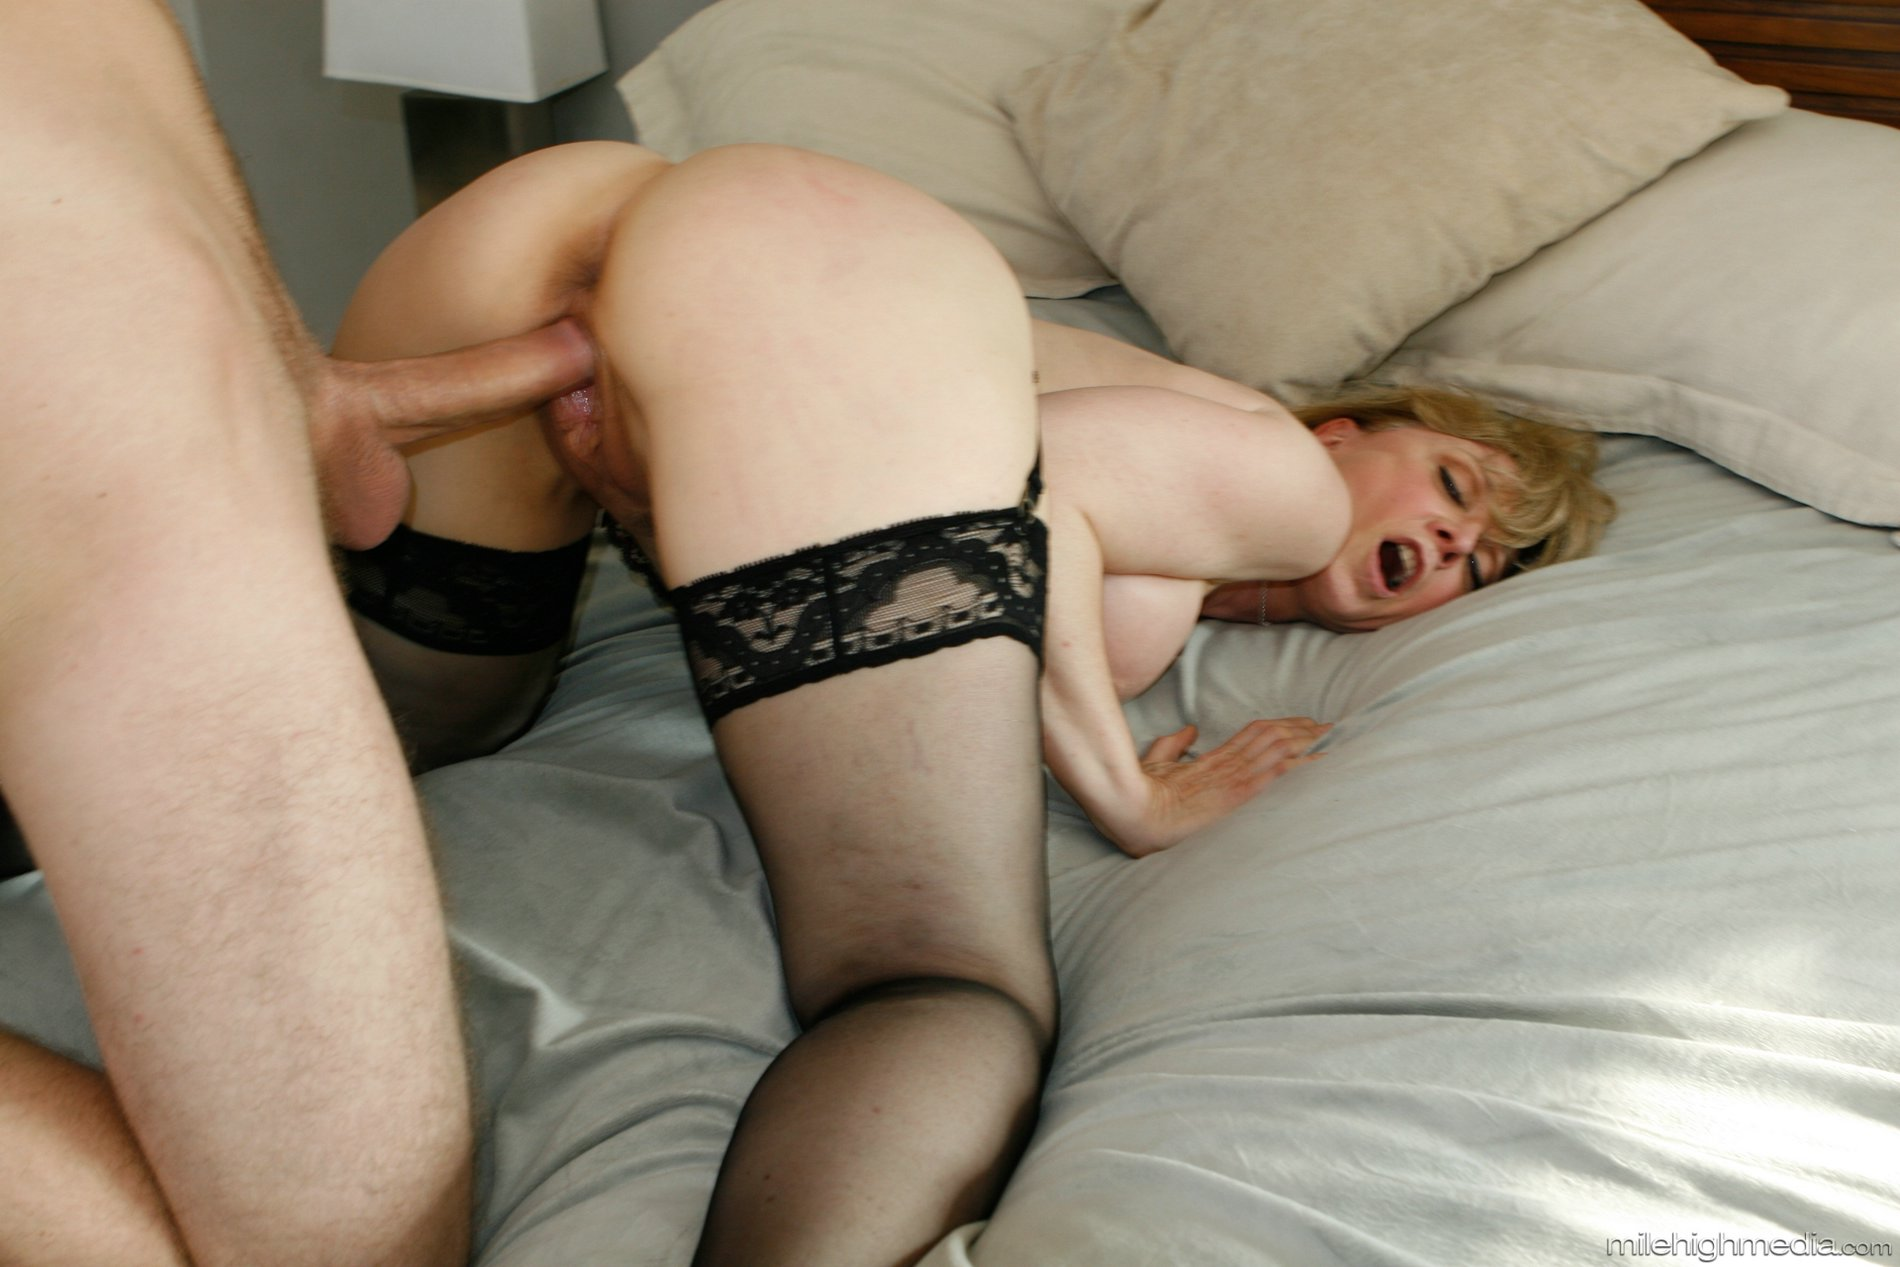 busty hentai princess gets sucking her bigtit